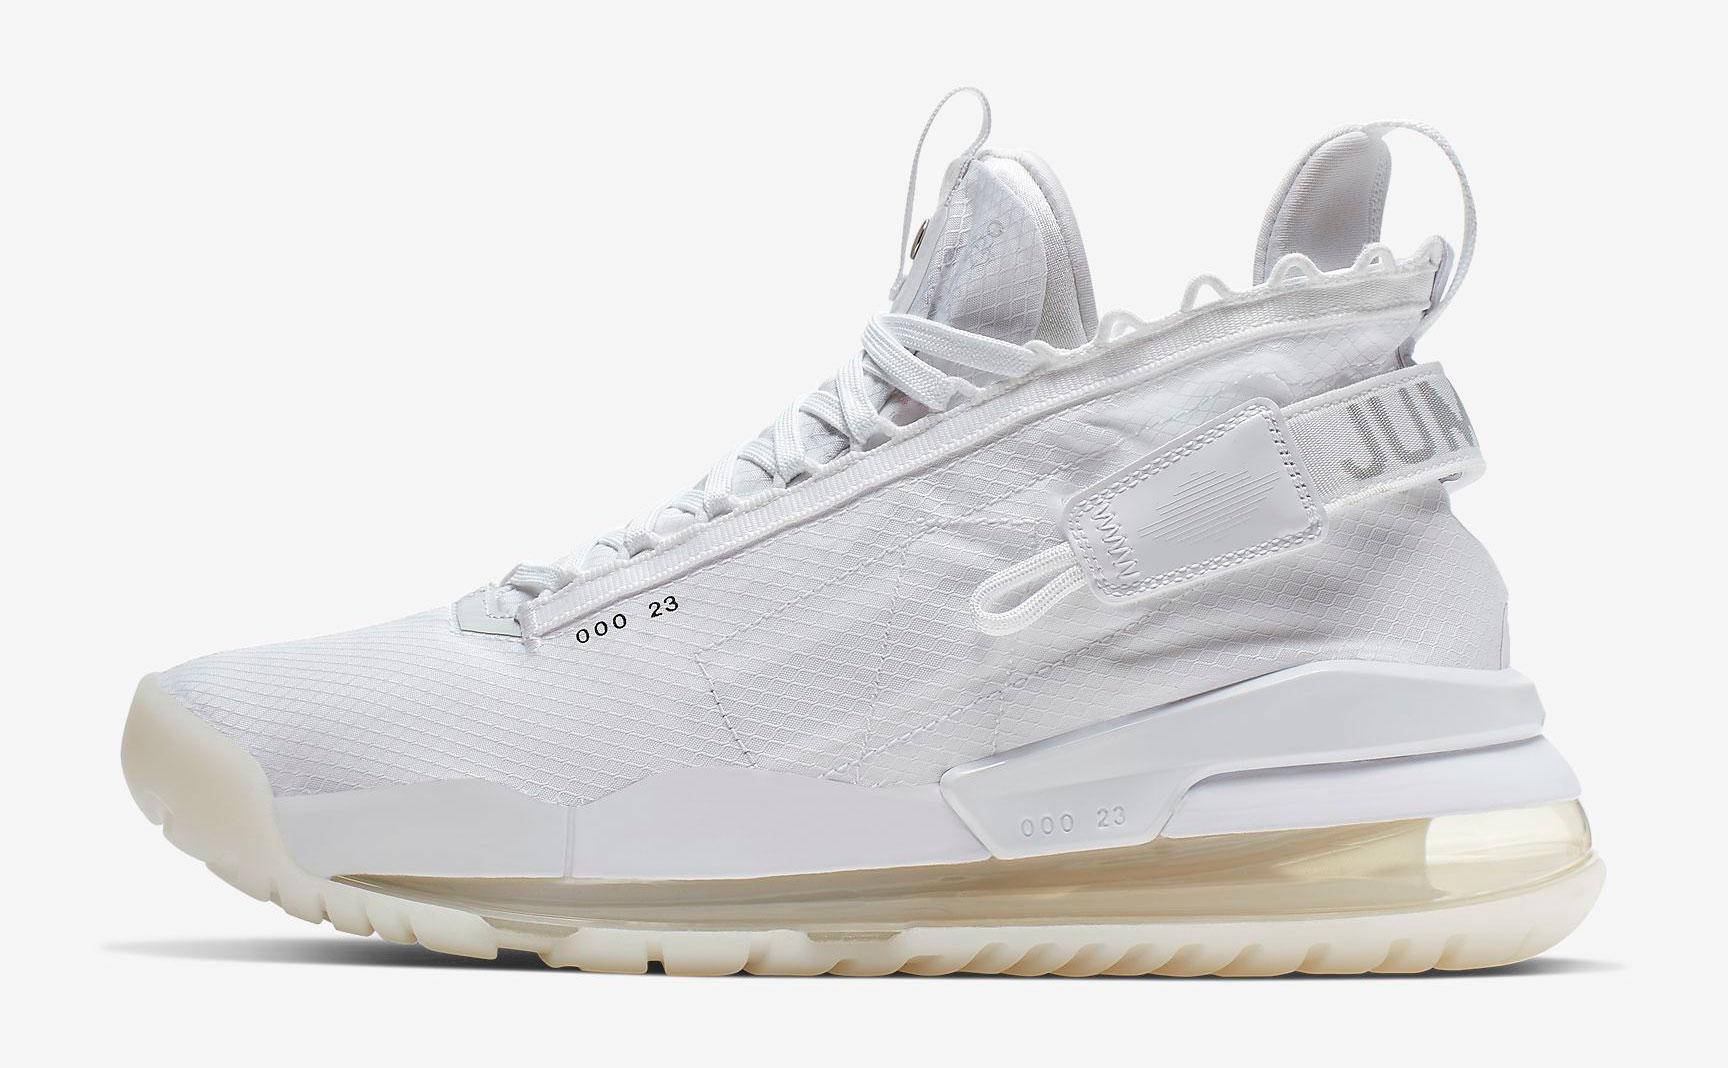 jordan-proto-max-720-white-platinum-release-date